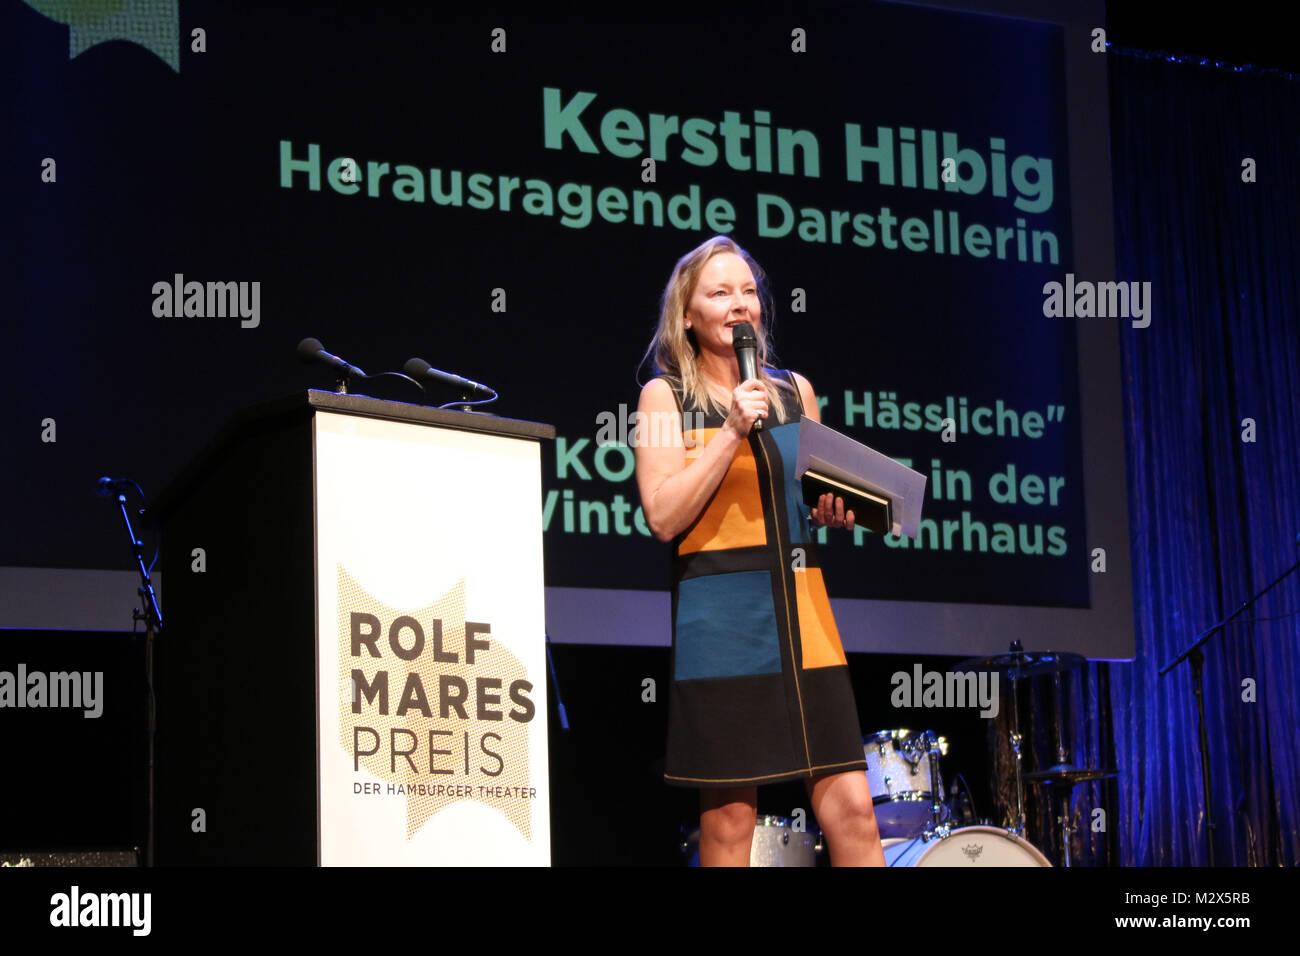 Meike Harten & Kerstin Hilbig, Rolf Mares Preis 2014, Kammerspiele Hamburg, 27.10.2014 - Stock Image